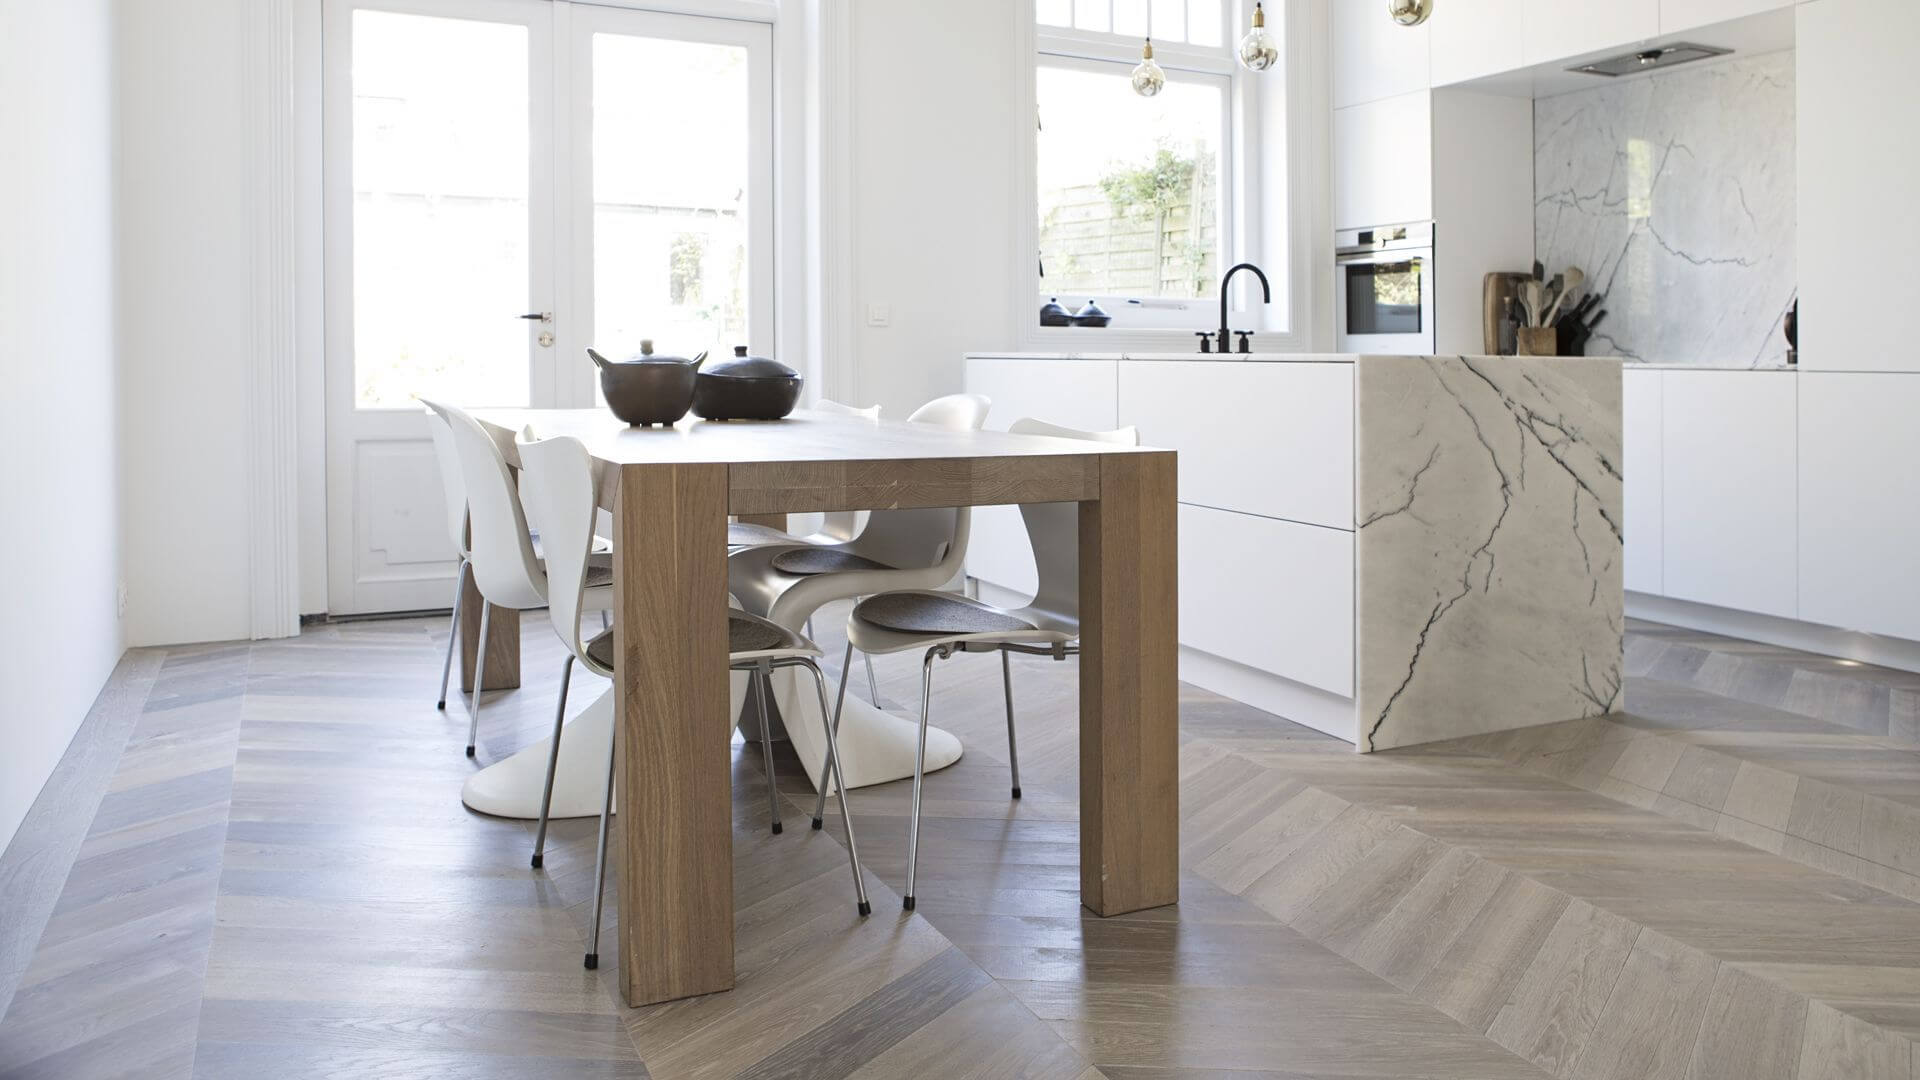 chevron floor in the kitchen